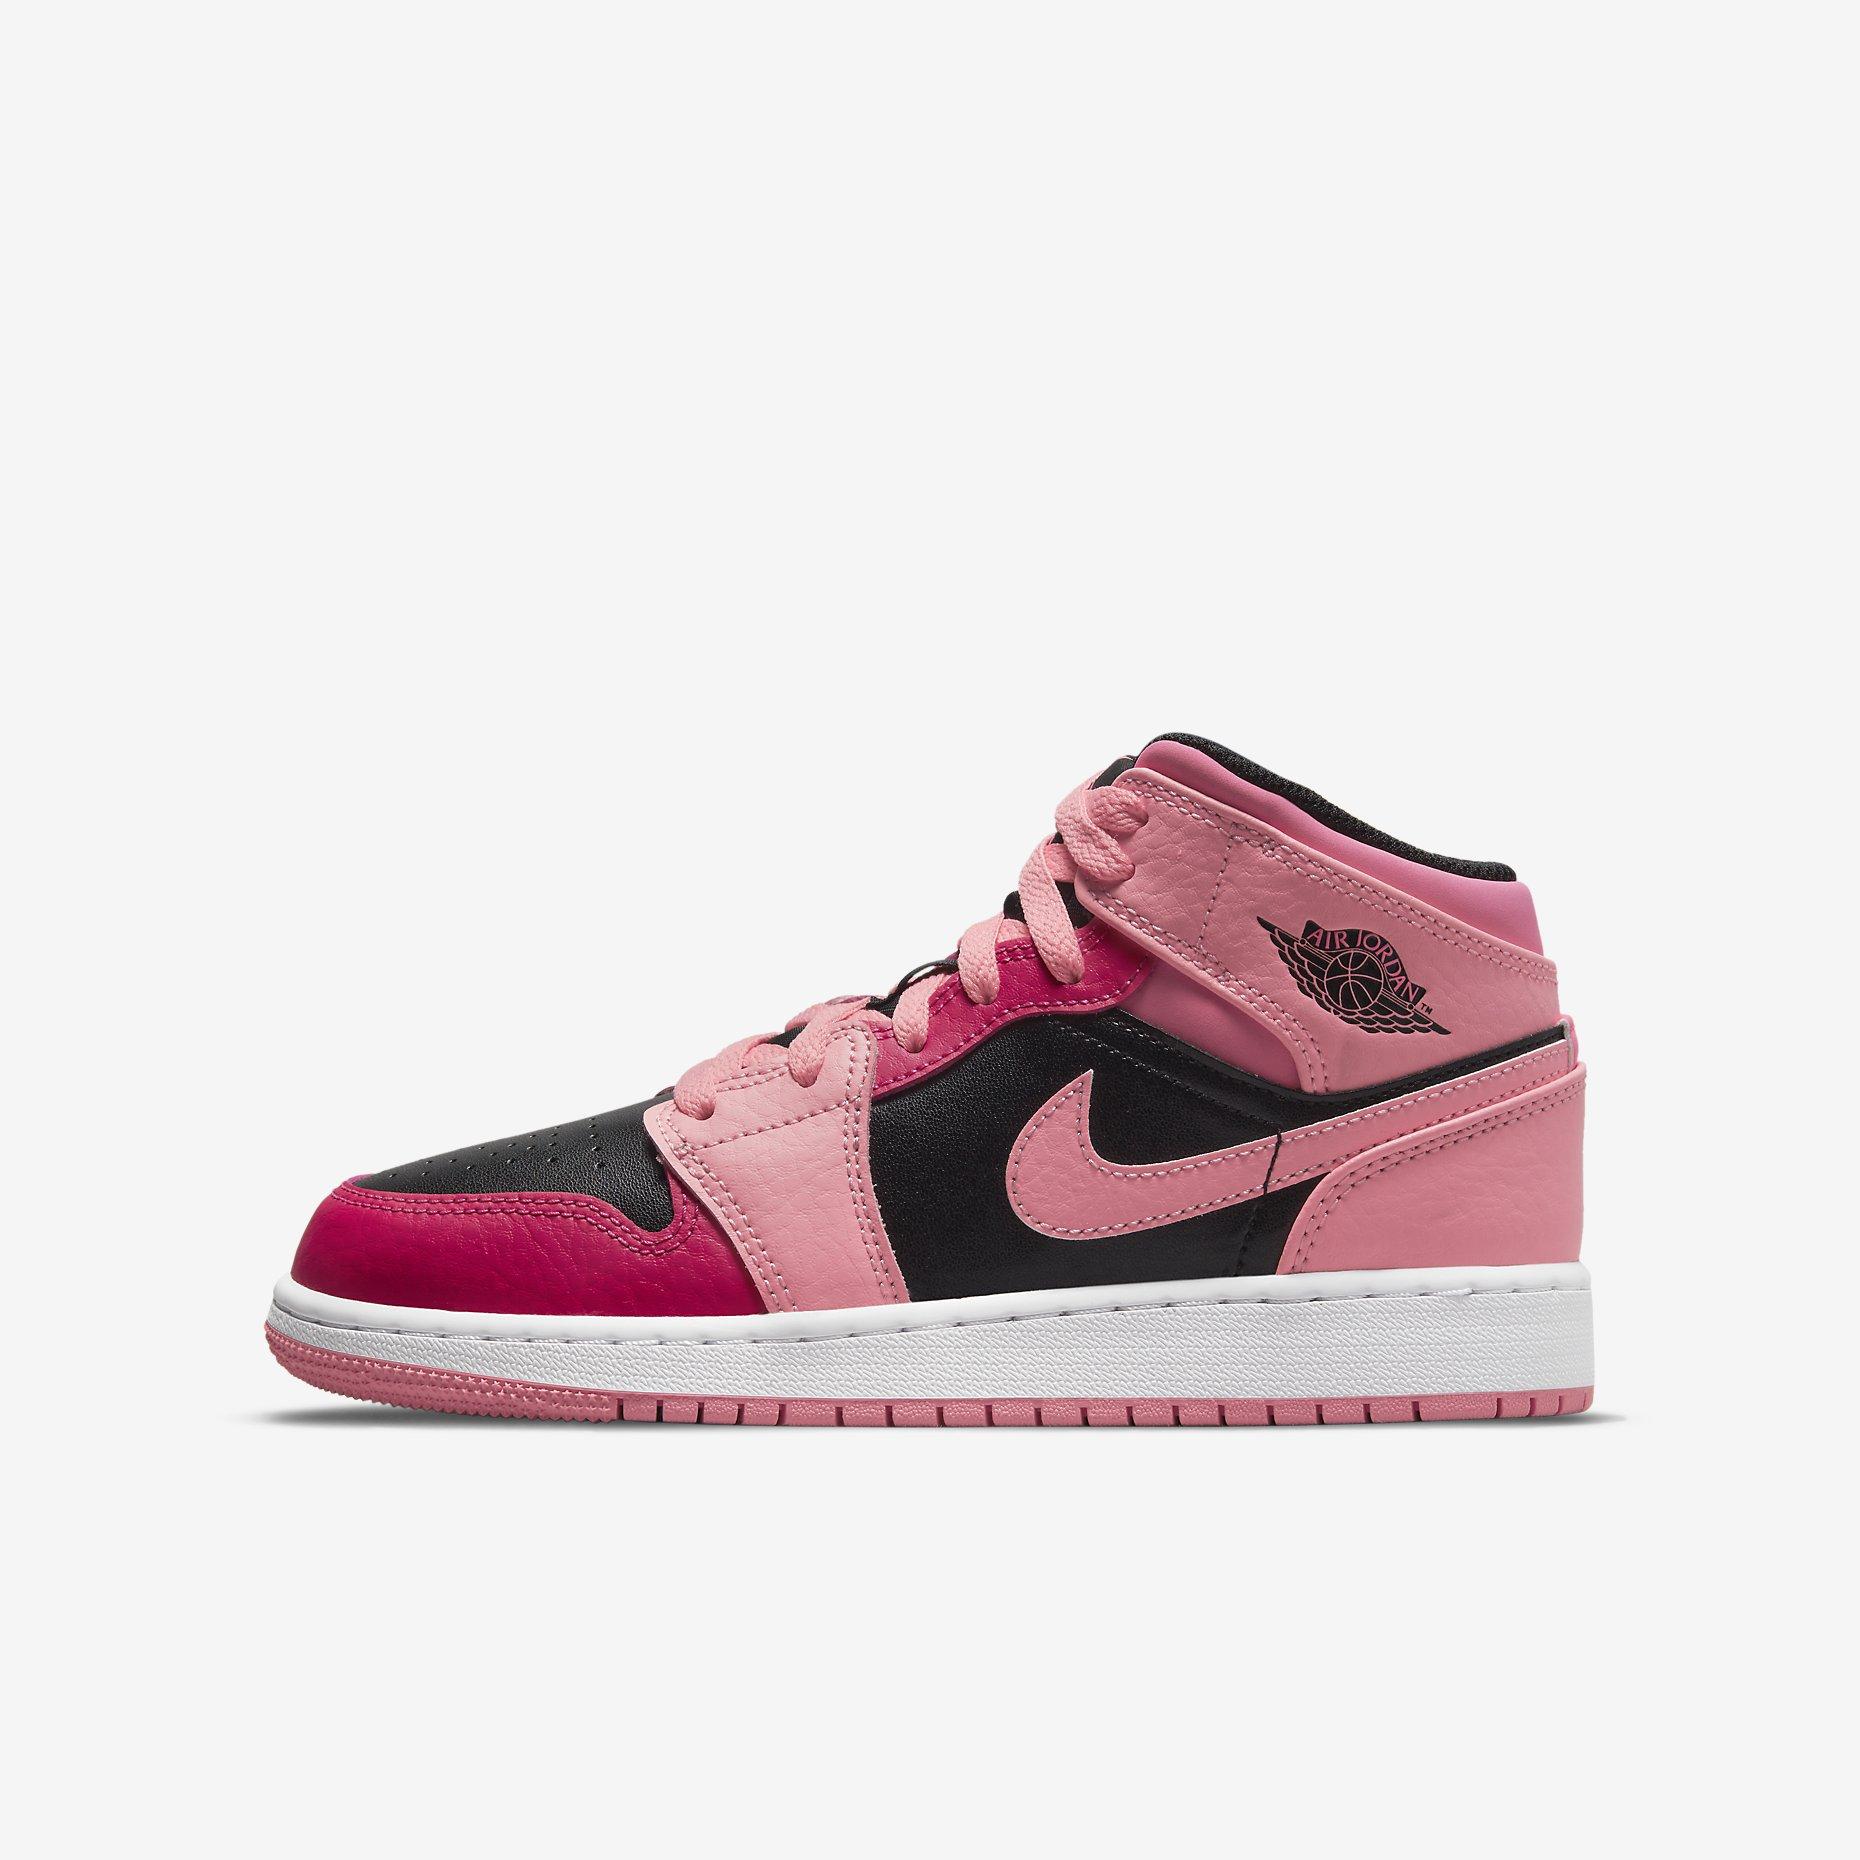 Air Jordan 1 Mid GS 'Coral Chalk Rush Pink'